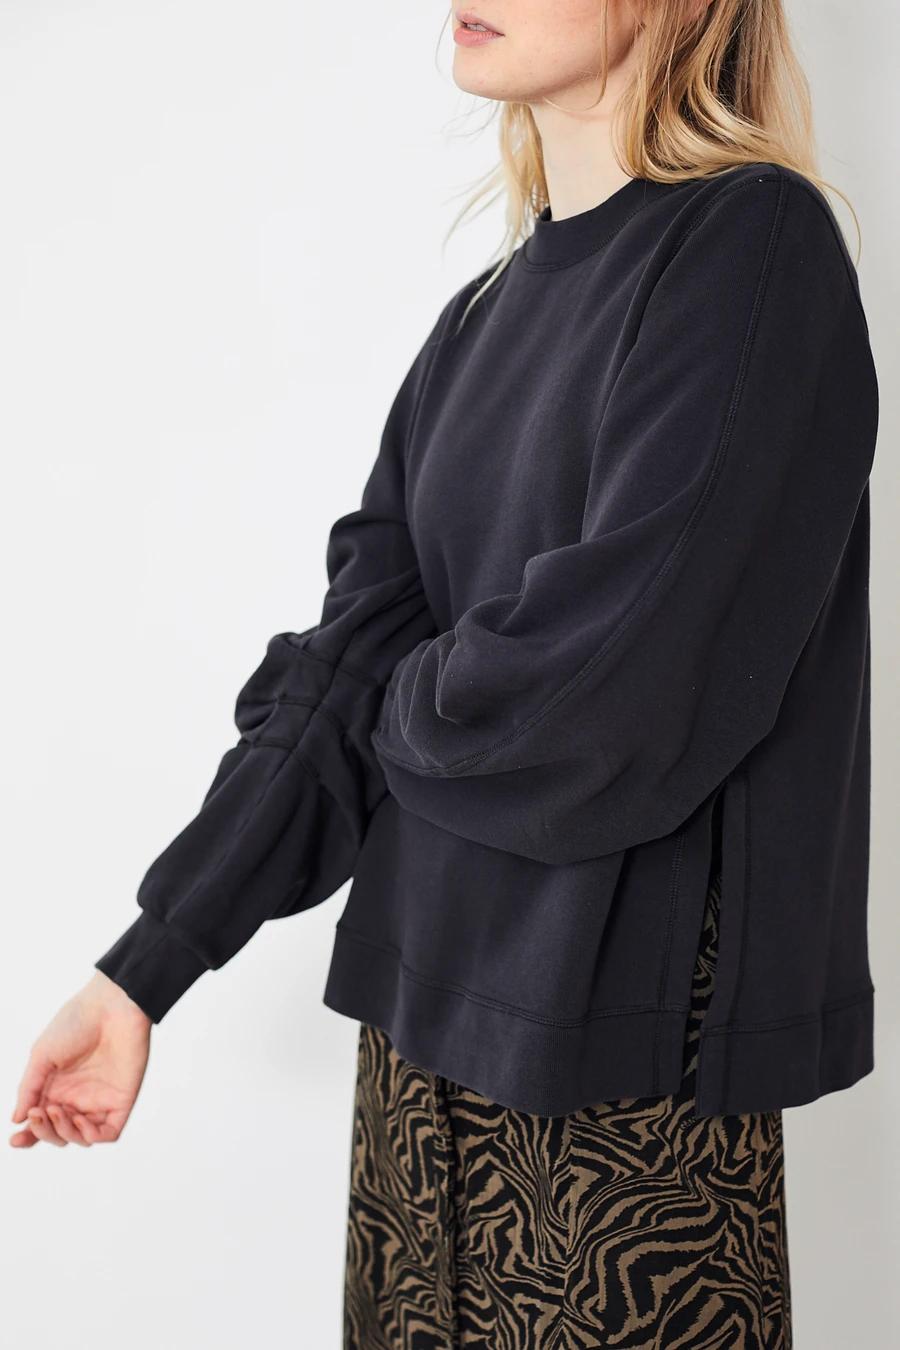 Ganni Isoli Sweatshirt W Pleated Sleeves Phantom Soft Pullover Sweatshirt In 100 Certified Organic Cotton Featur Pleated Sleeves Soft Pullover Sweatshirts [ 1350 x 900 Pixel ]